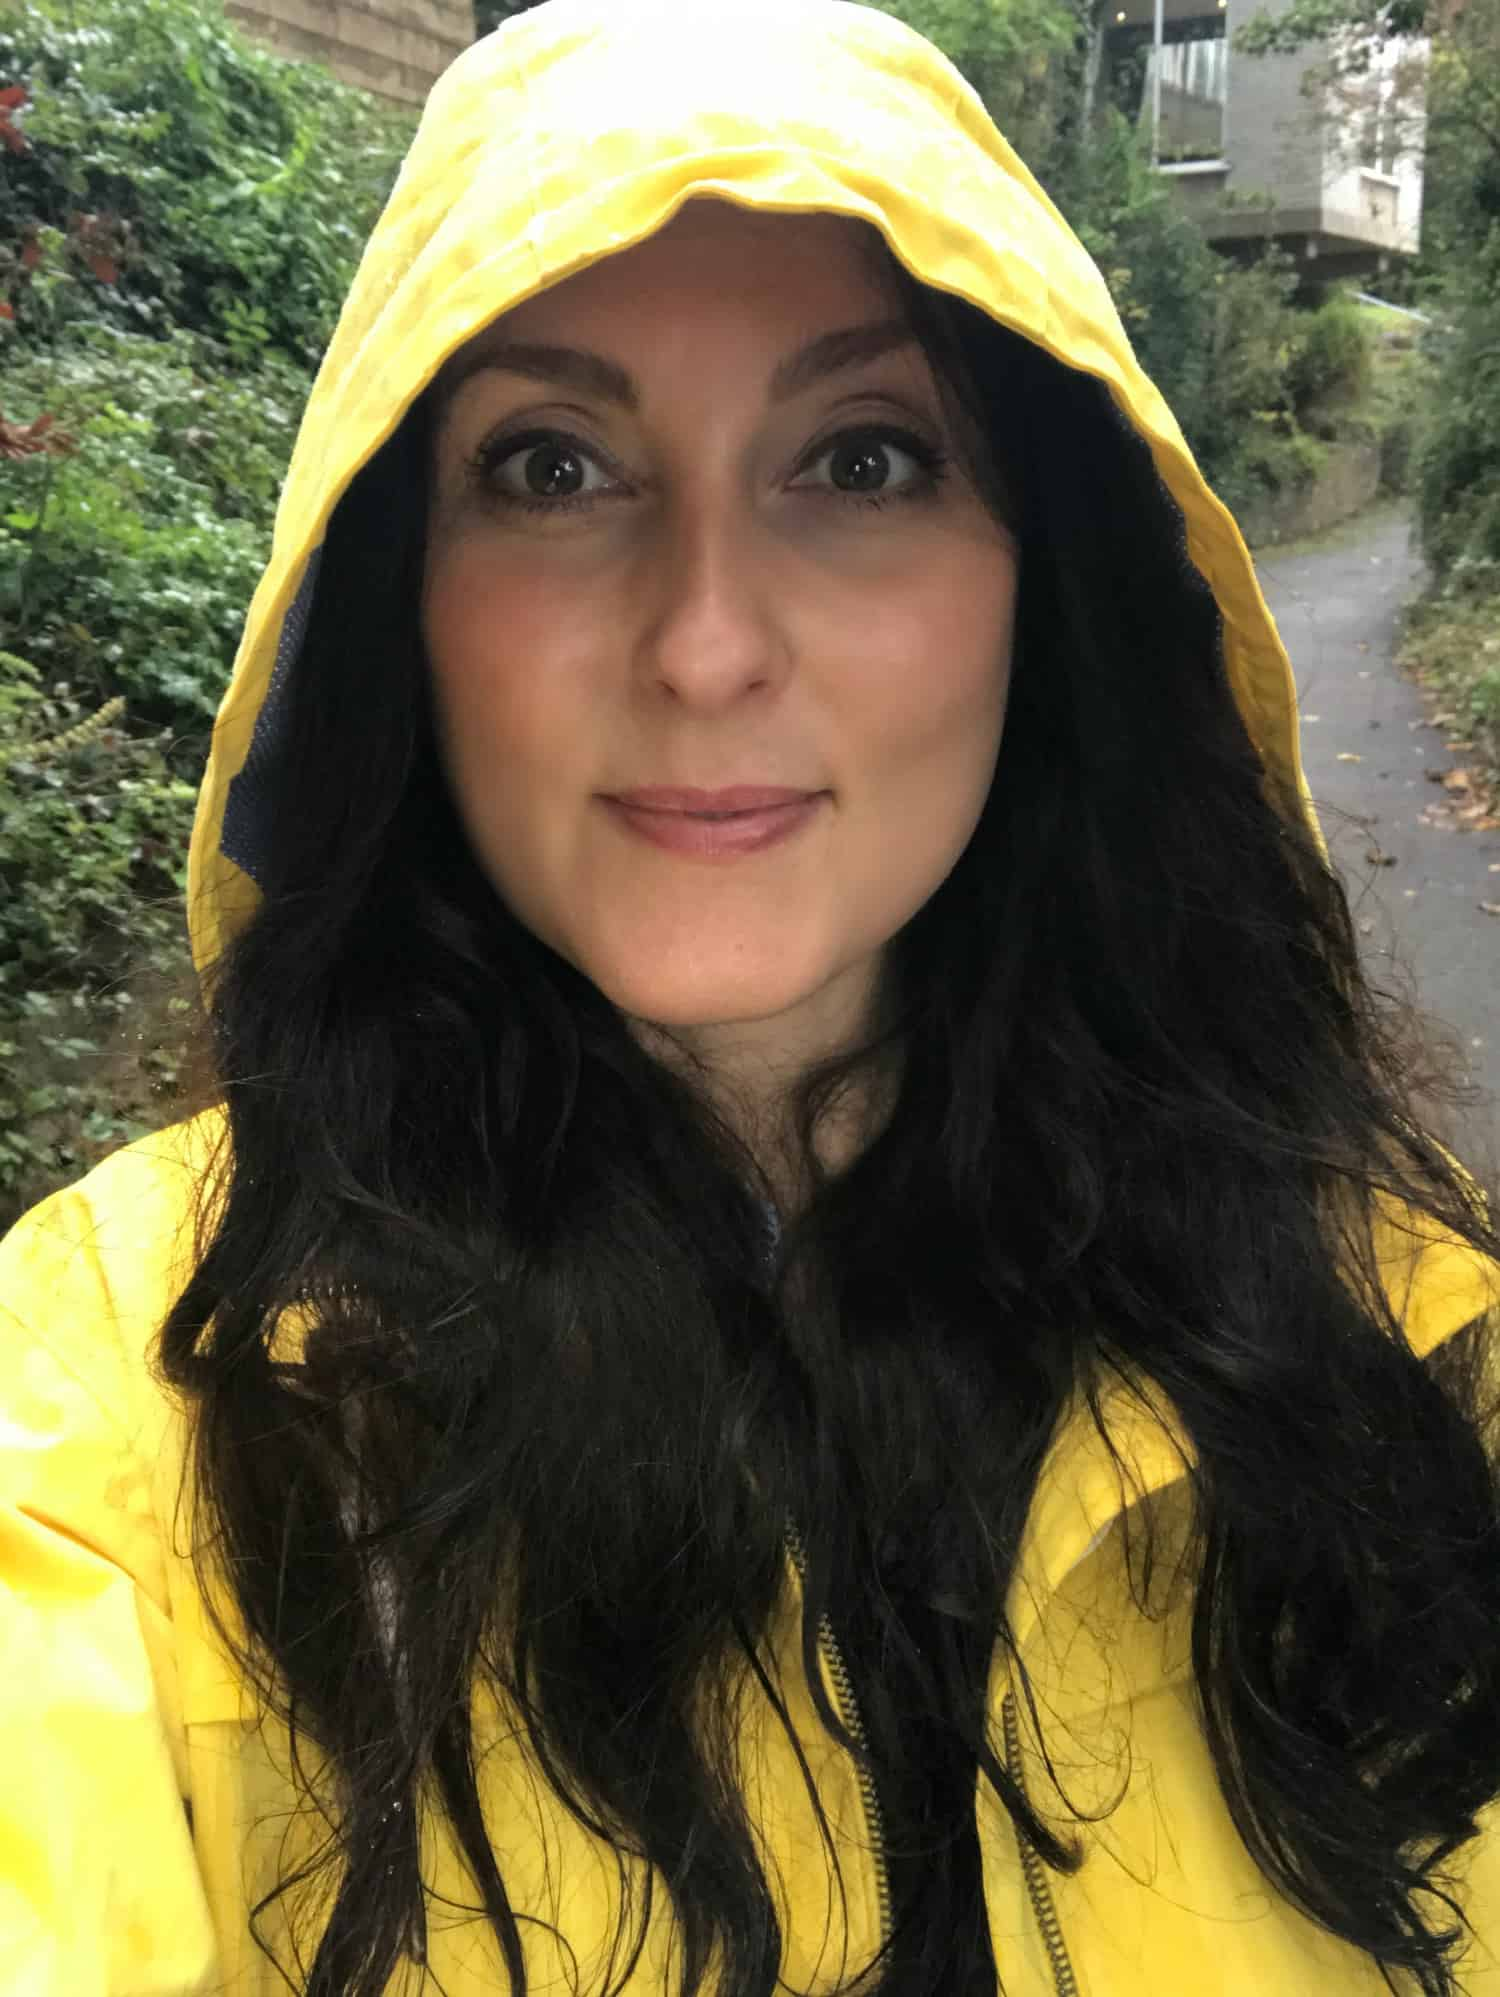 Lighthouse yellow raincoat